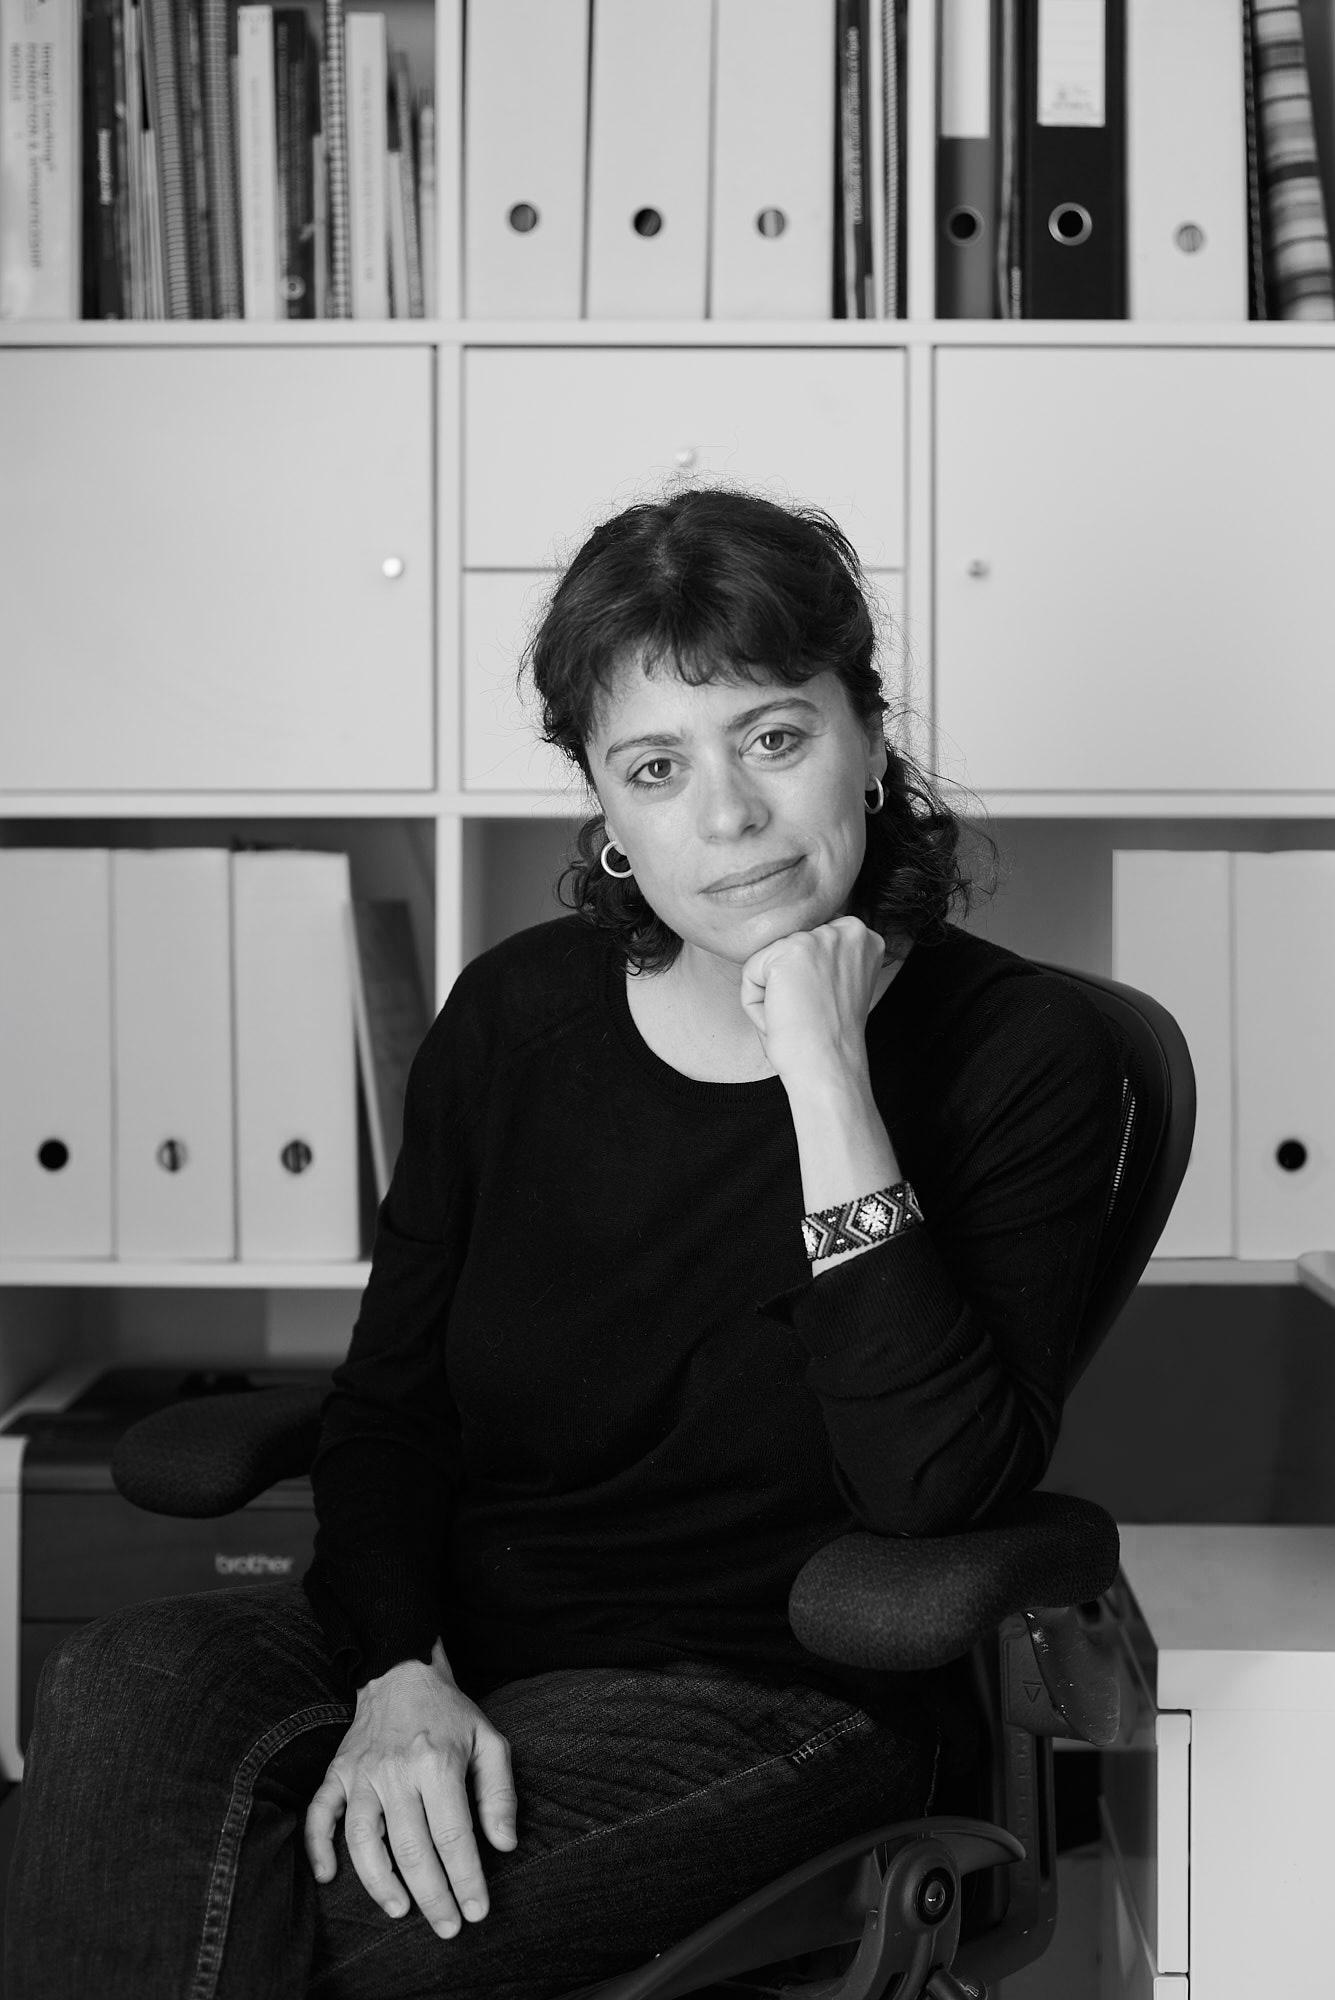 Sandra Benbeniste, director of the Ibiza Preservation Foundation